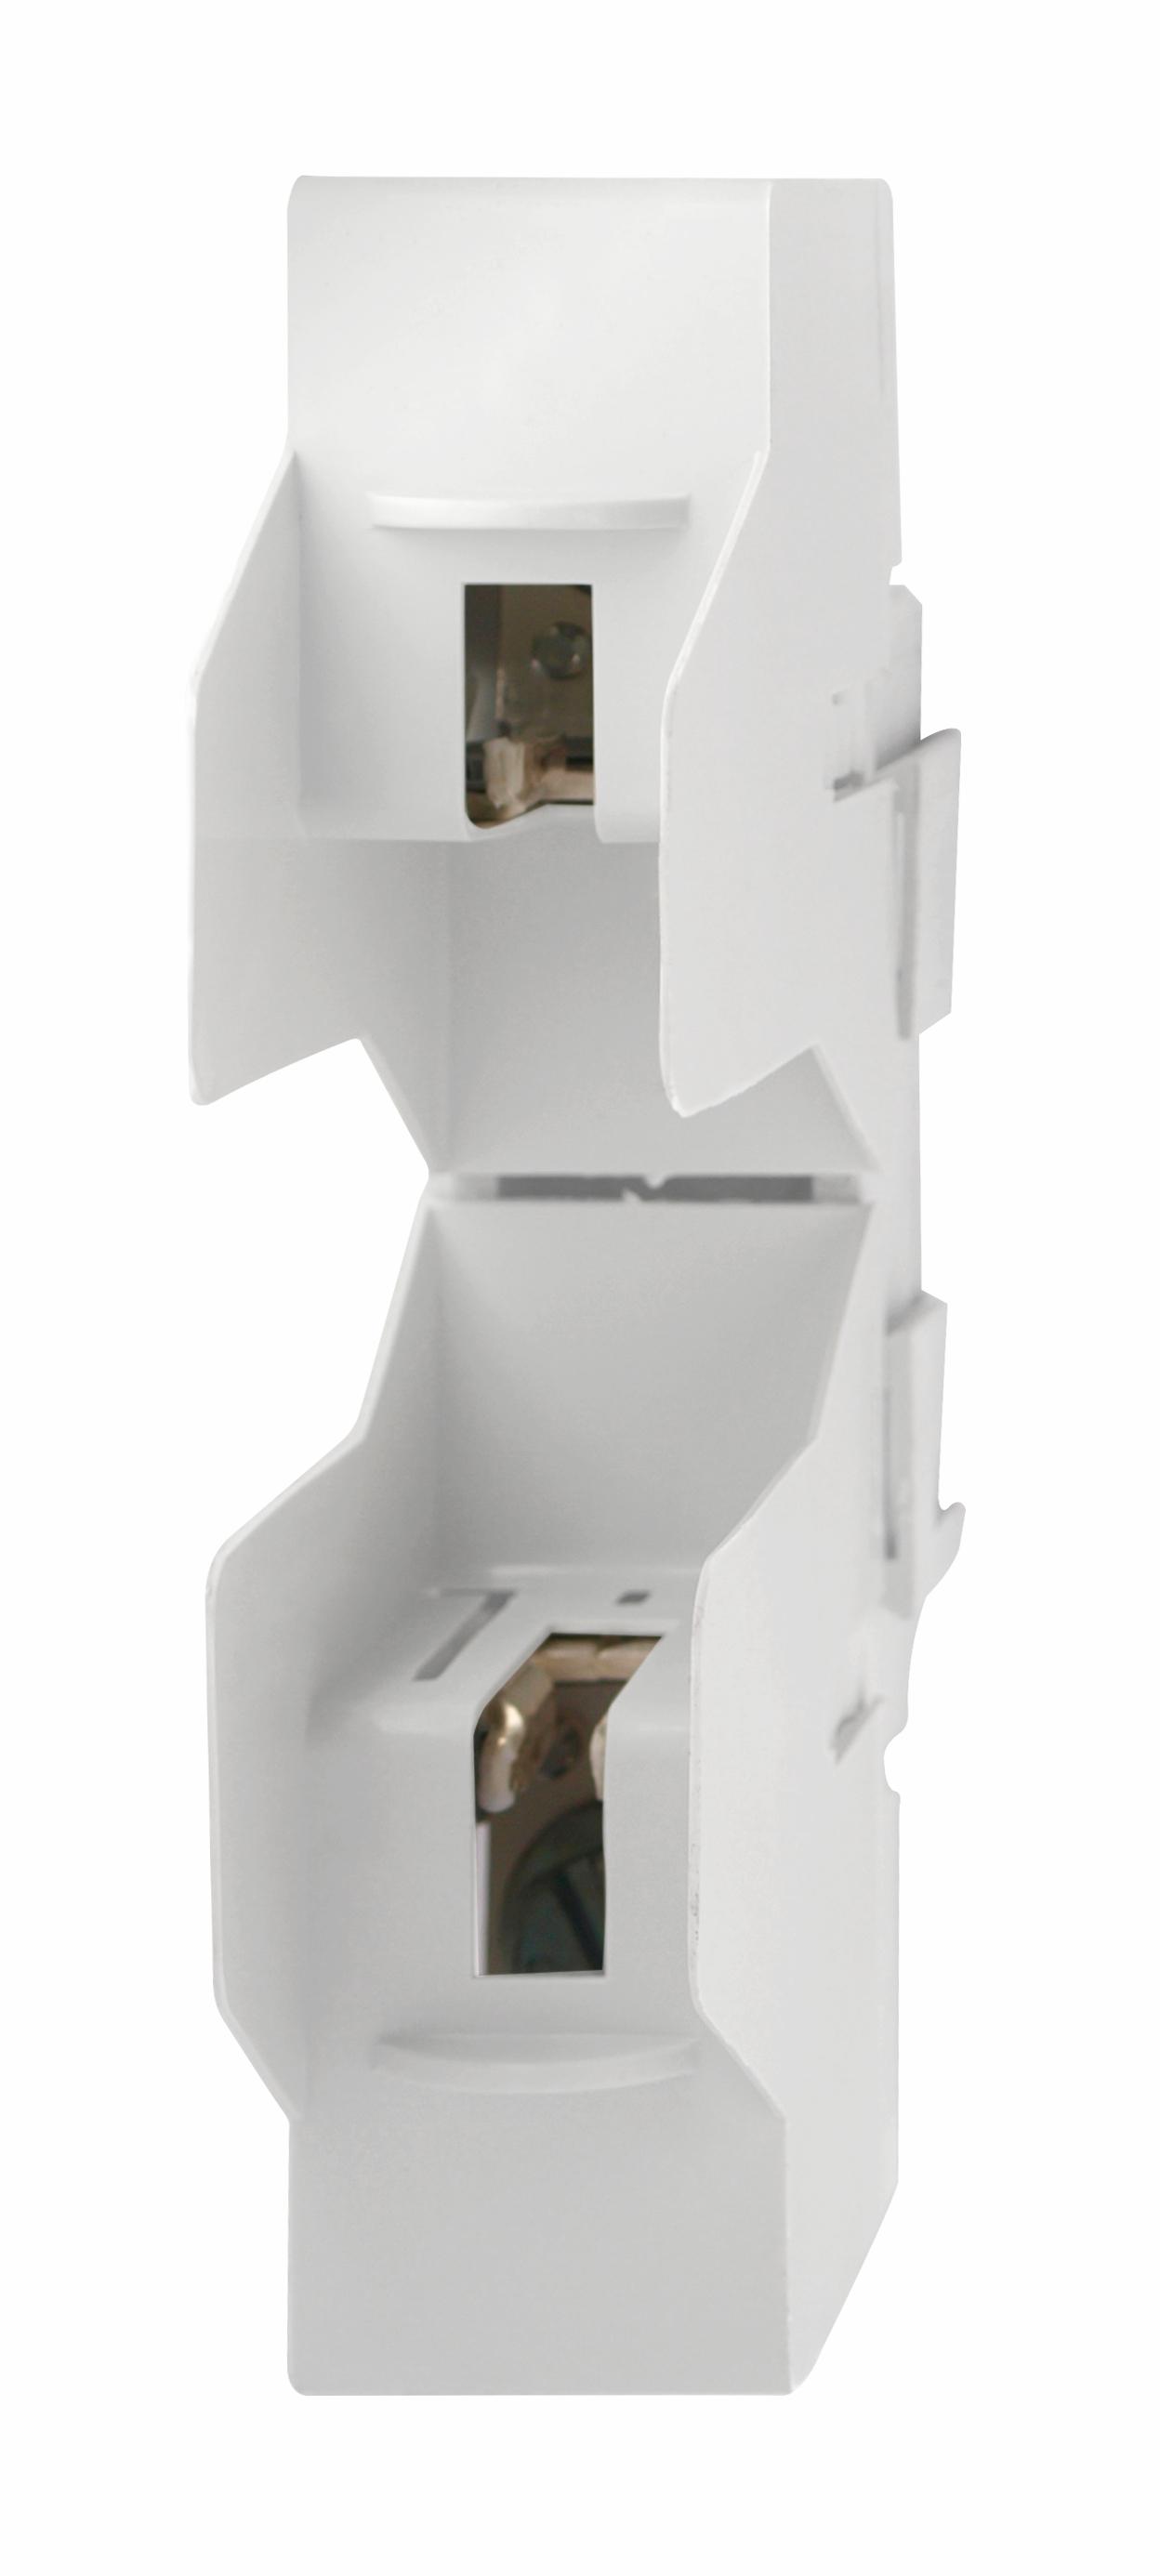 1 Stk NH-Sicherungsunterteil Gr.00, 160A,1-polig, Aufbau, Schraube SI037580--